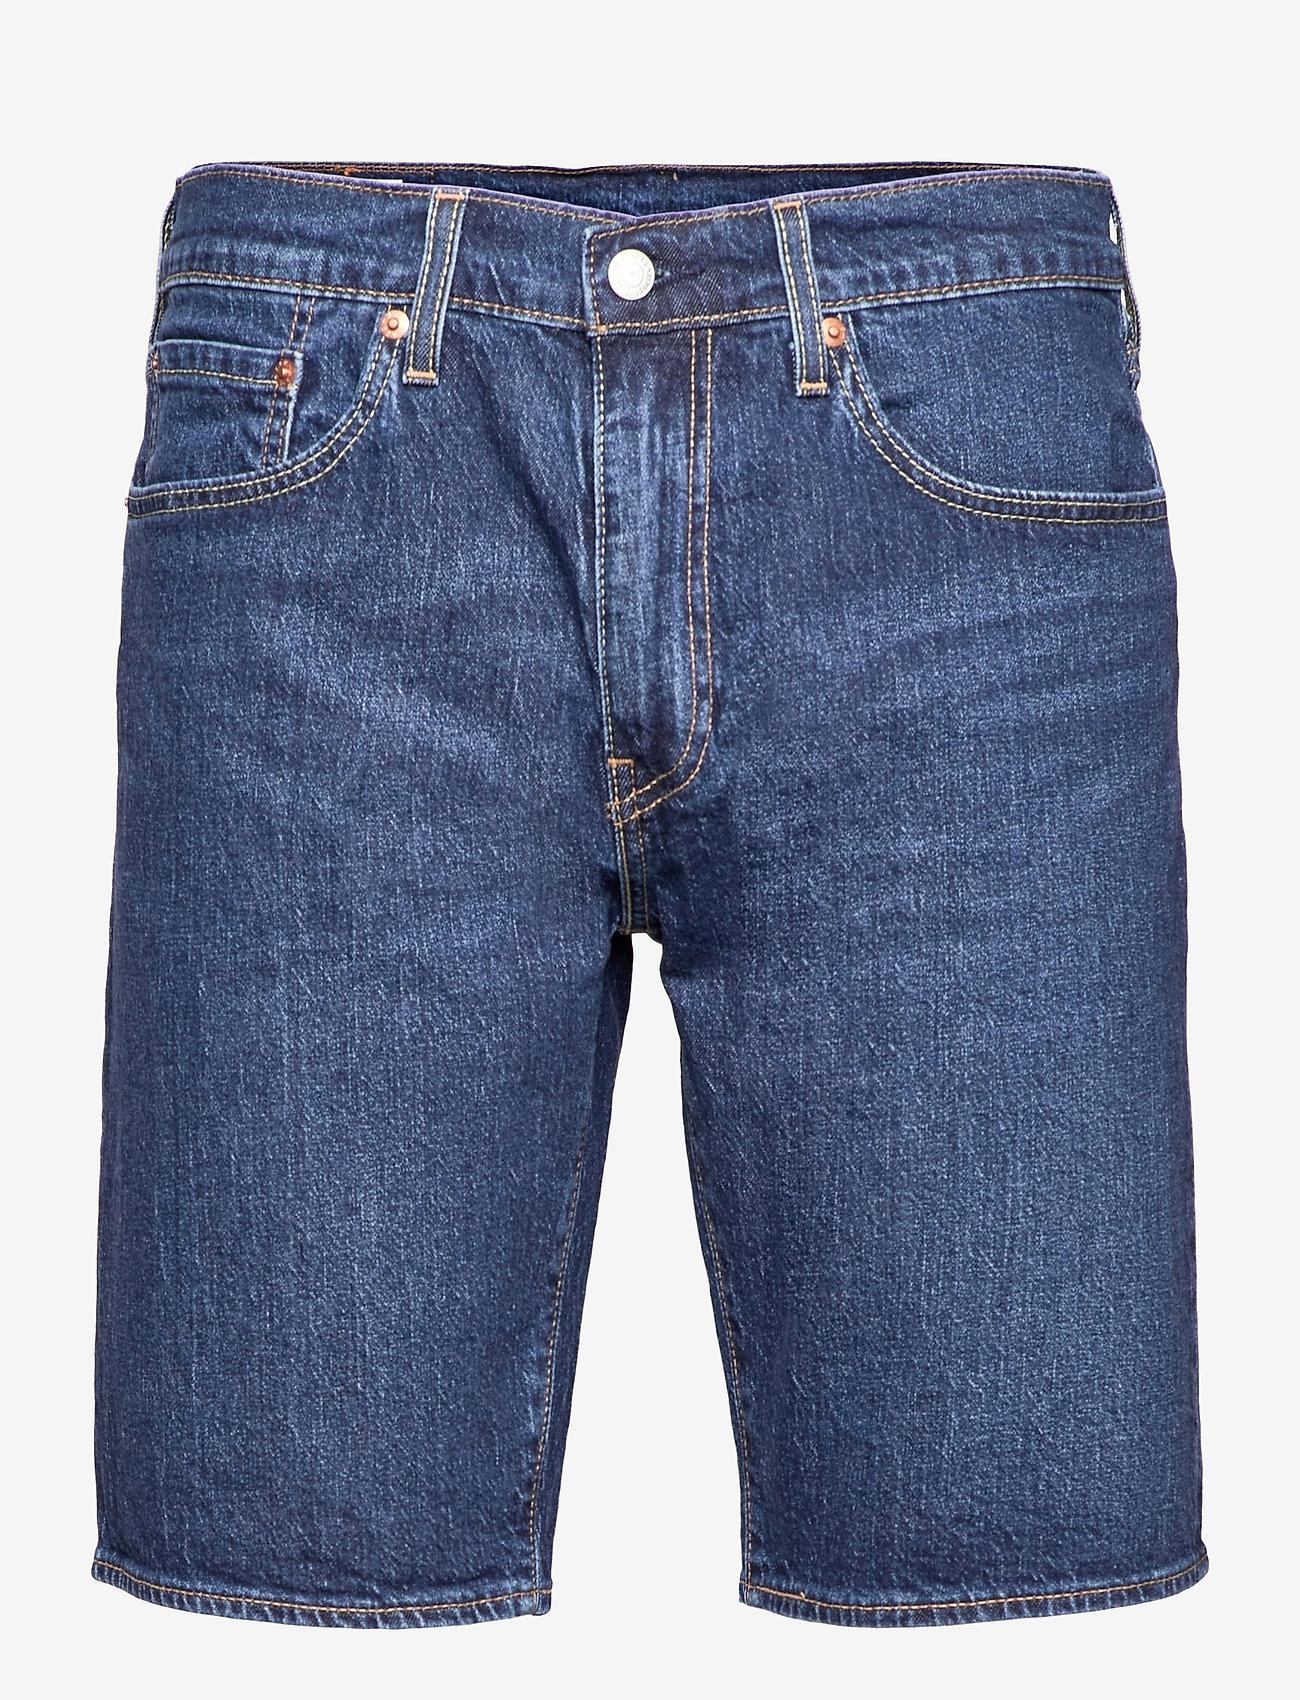 LEVI´S Men - 405 STANDARD SHORT DANCE FLOOR - jeansowe szorty - med indigo - flat finish - 0